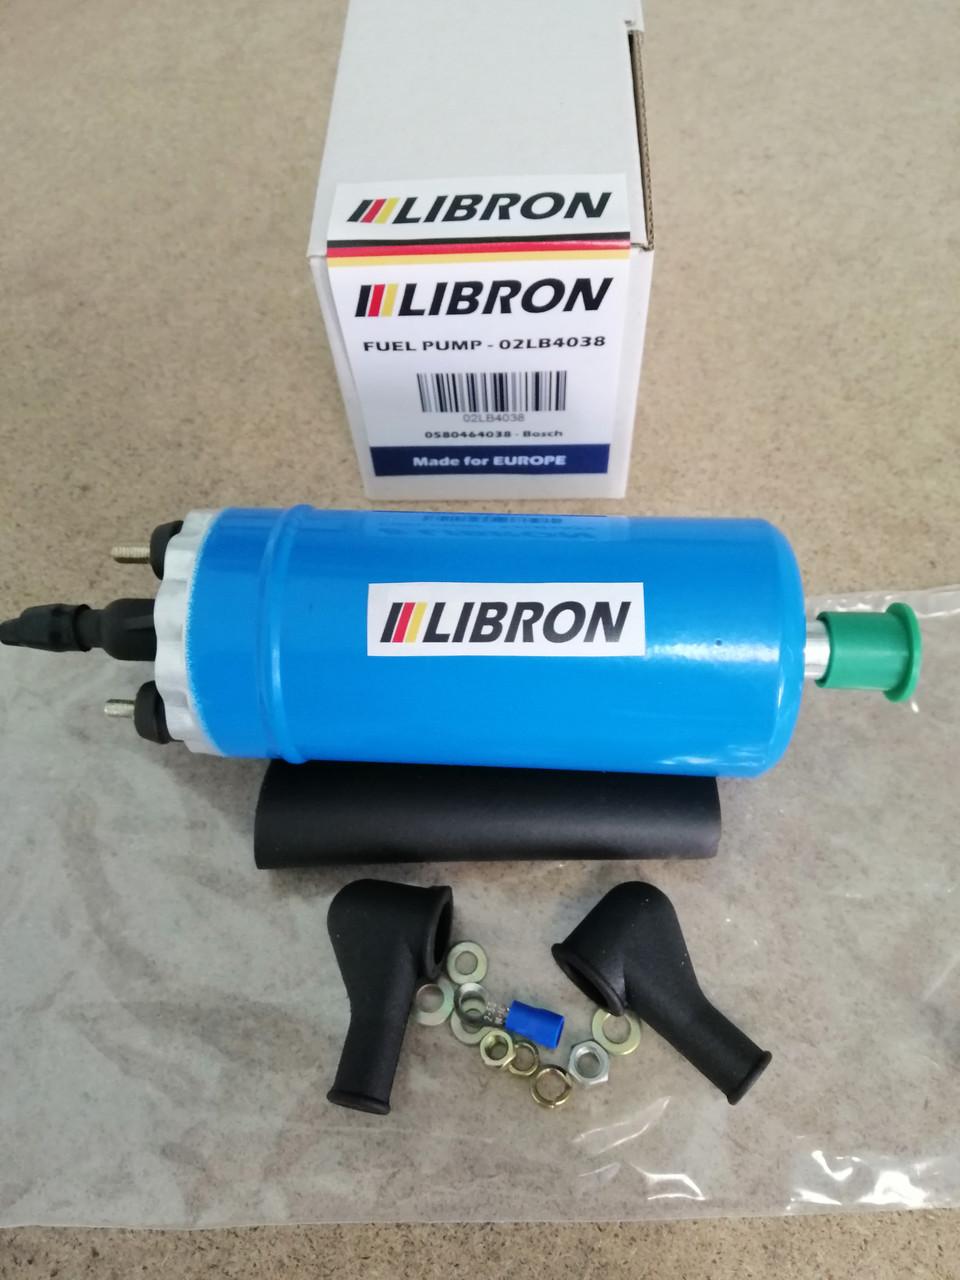 Бензонасос LIBRON 02LB4038 - BMW 3 (E30) 320 i (1985-1985)